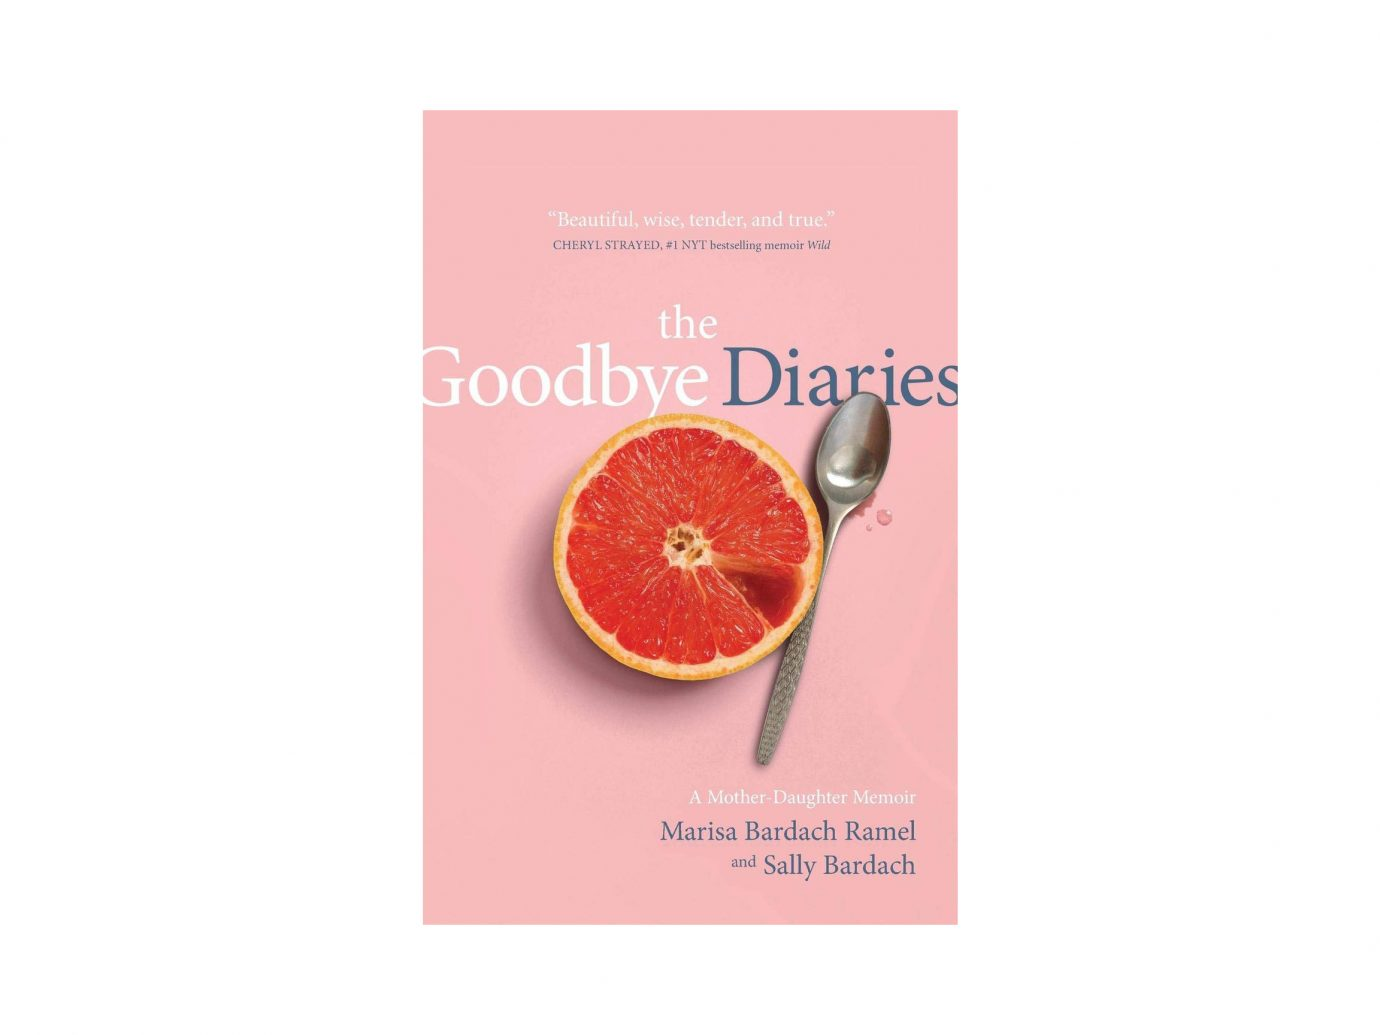 The Goodbye Diaries: A Mother-Daughter Memoir